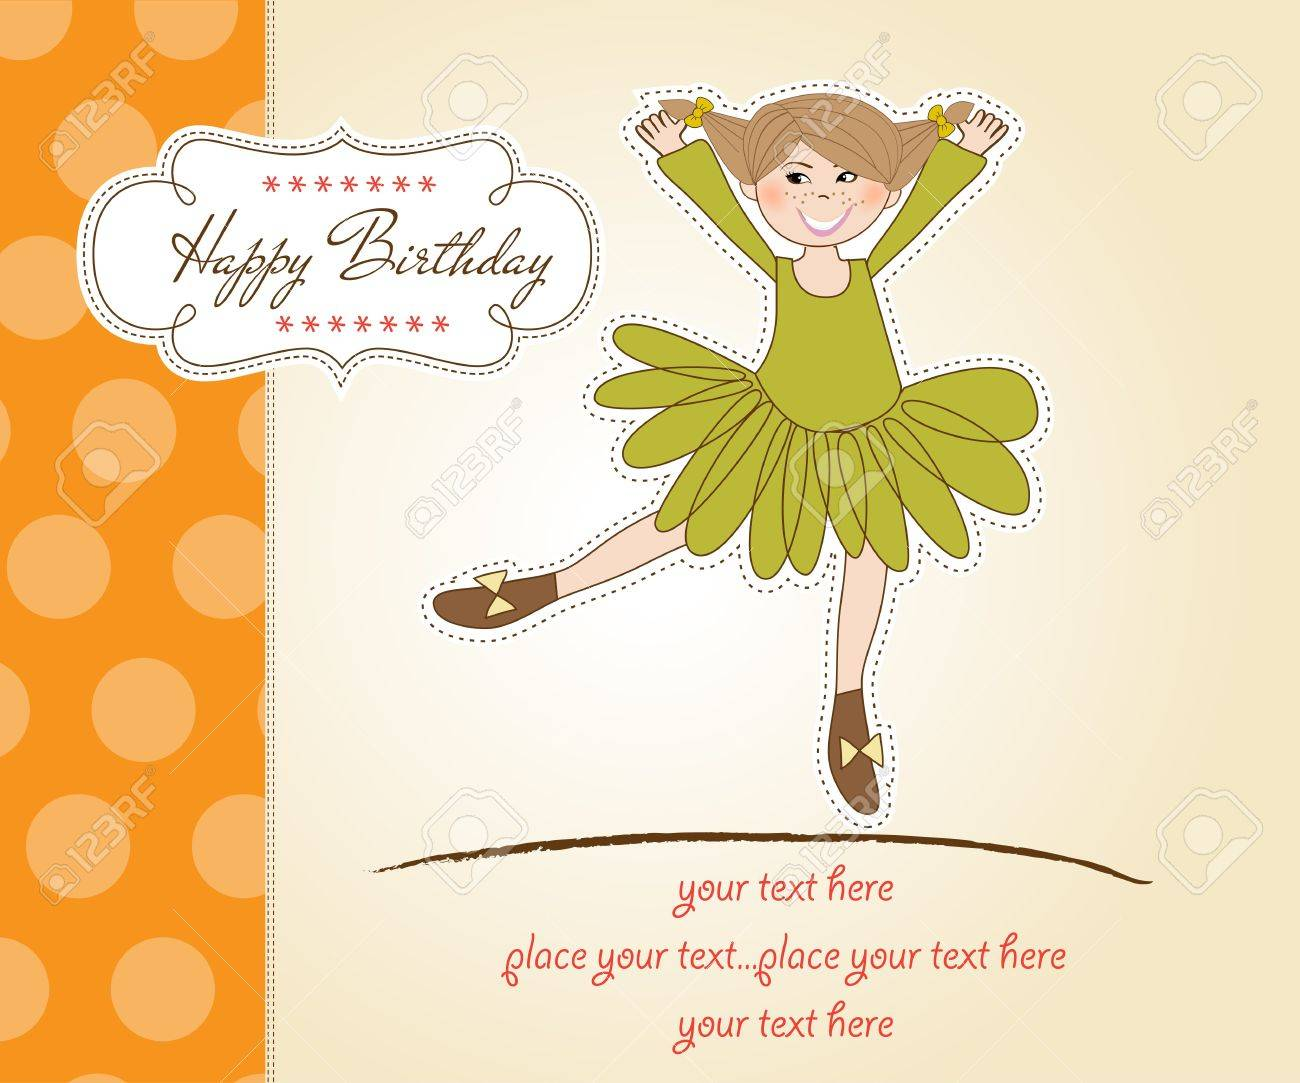 Sweet Girl Birthday Greeting Card Stock Vector - 11021805